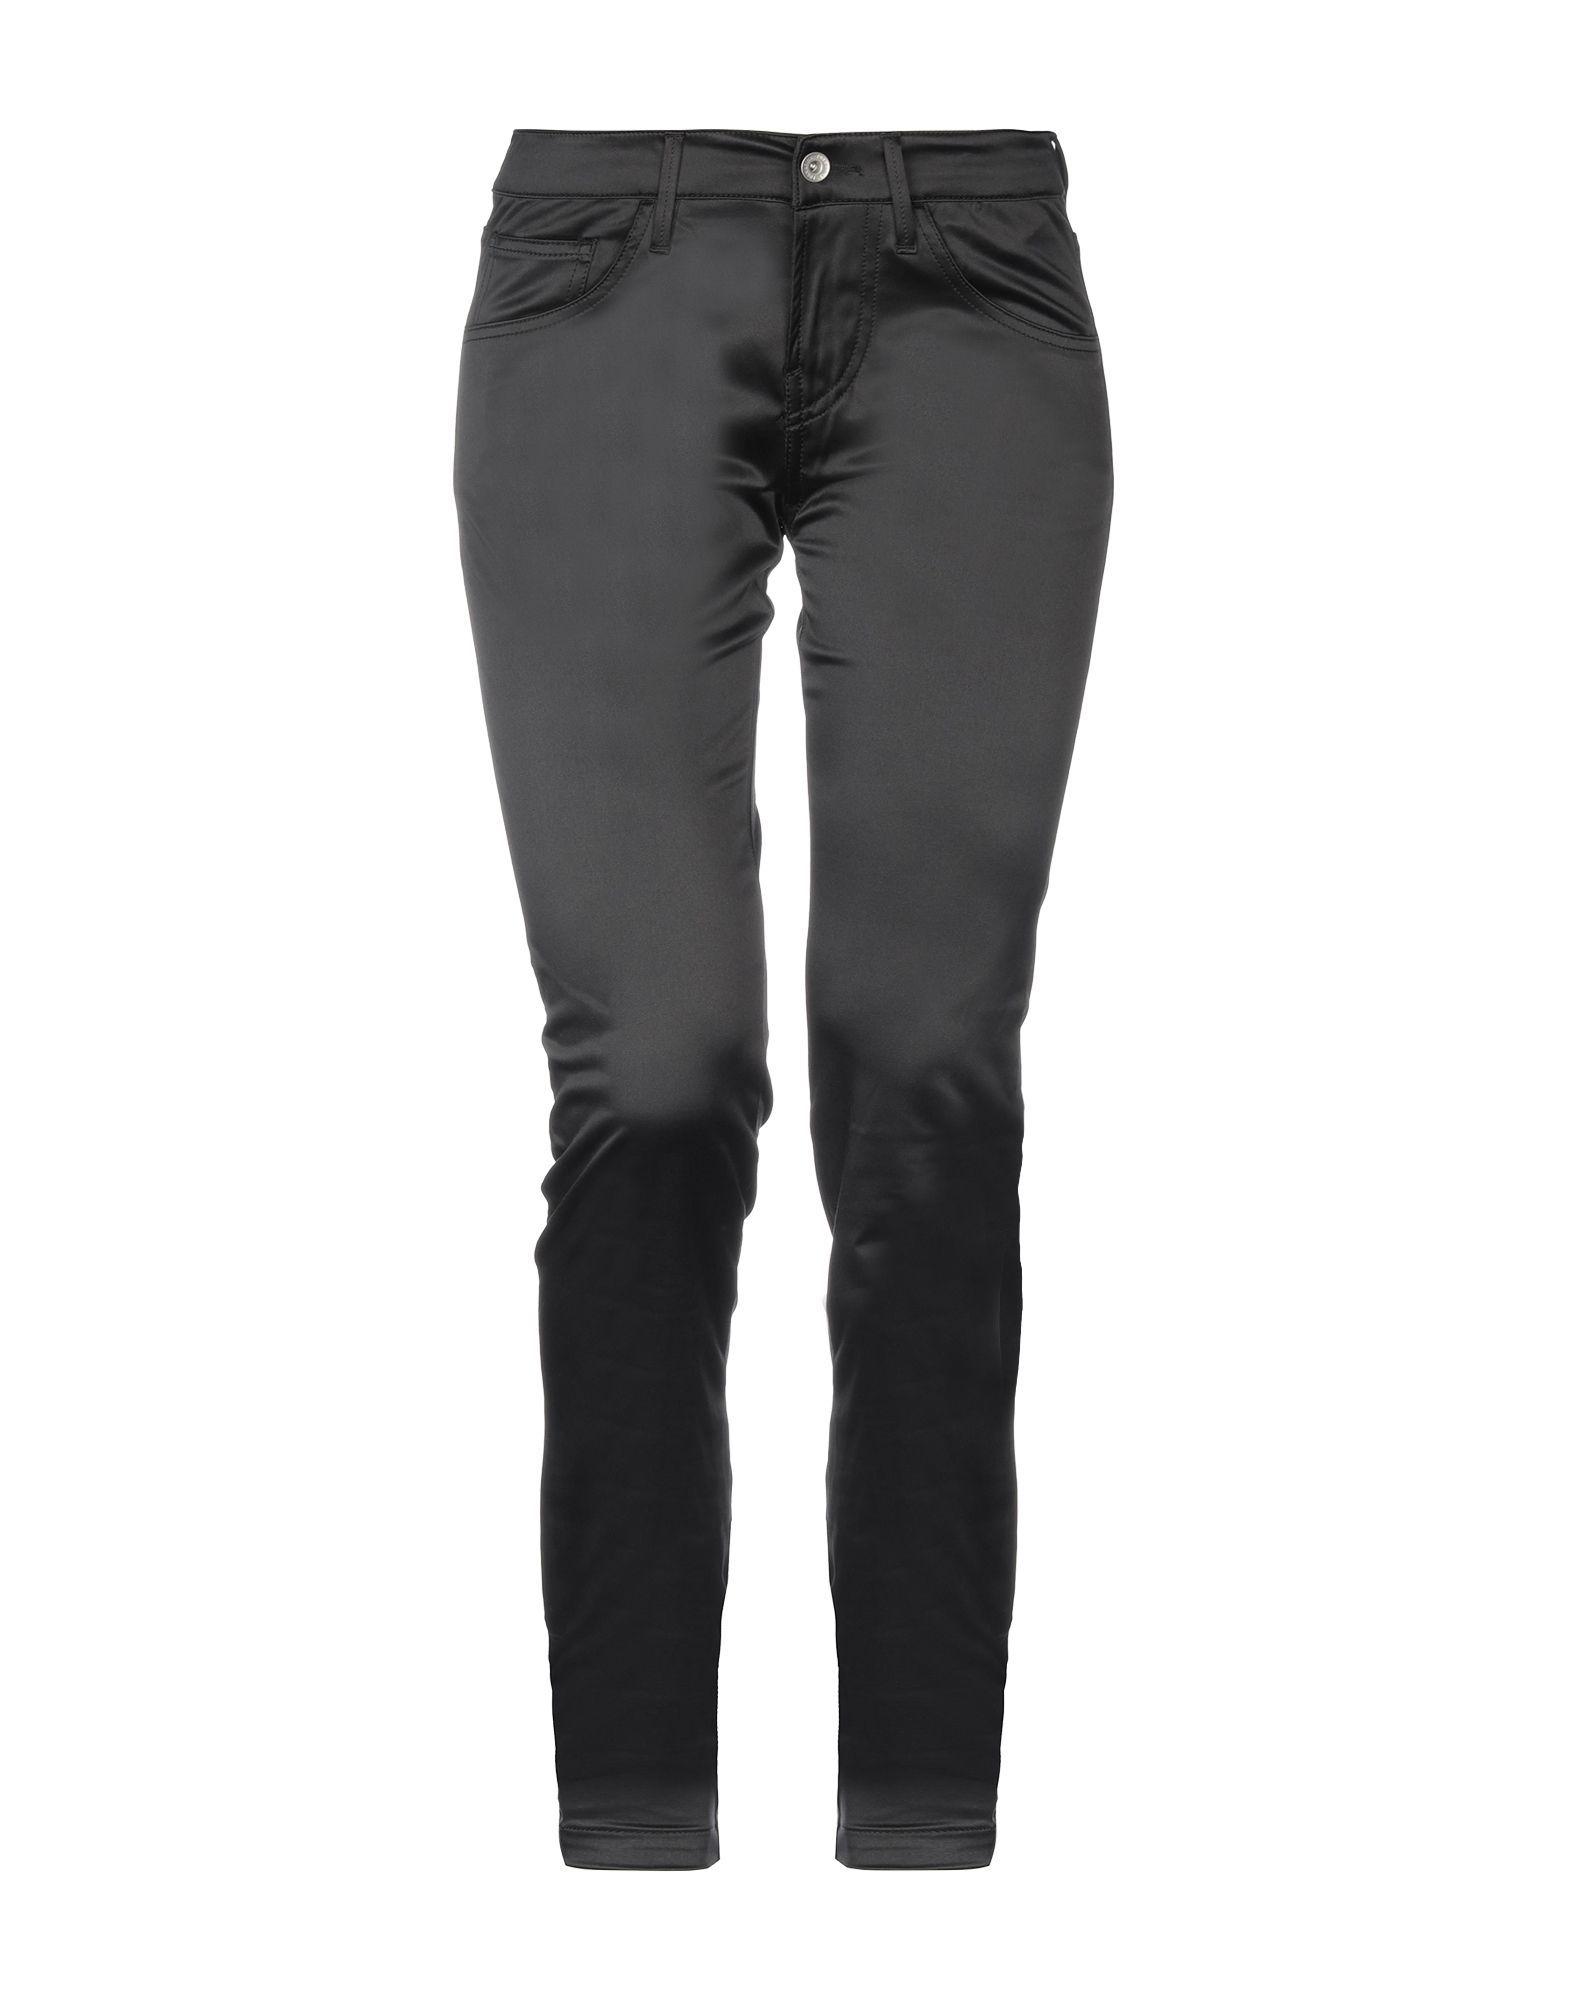 Fornarina Black Satin Tapered Leg Trousers